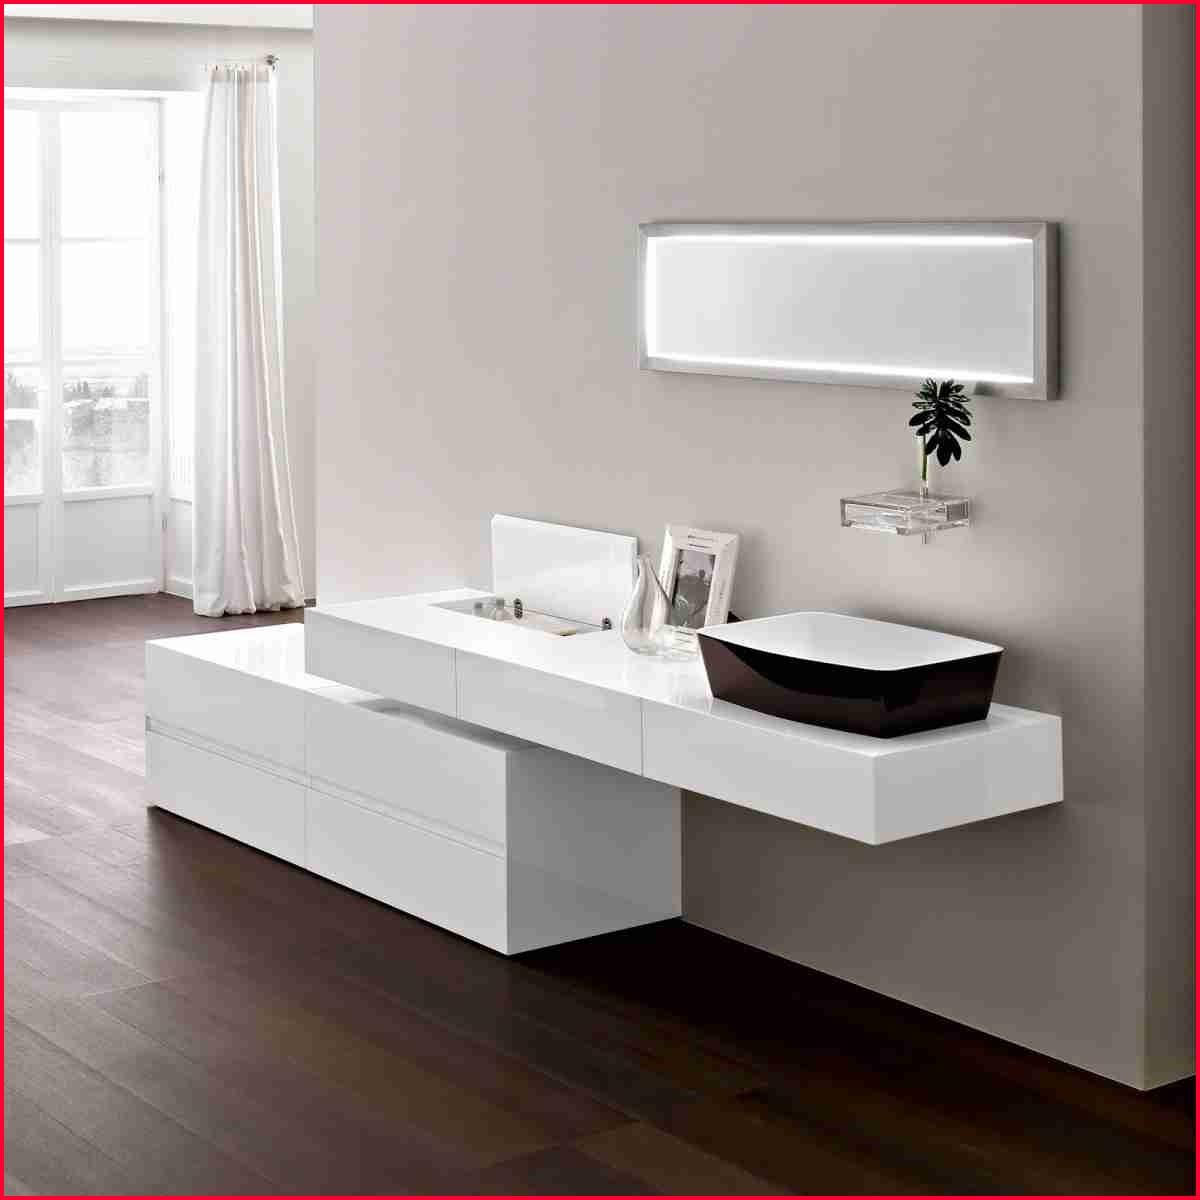 Muebles Para Baños Etdg Mueble Baà O 2622 Magnifique Muebles De Banos Modernos Para Ba C3